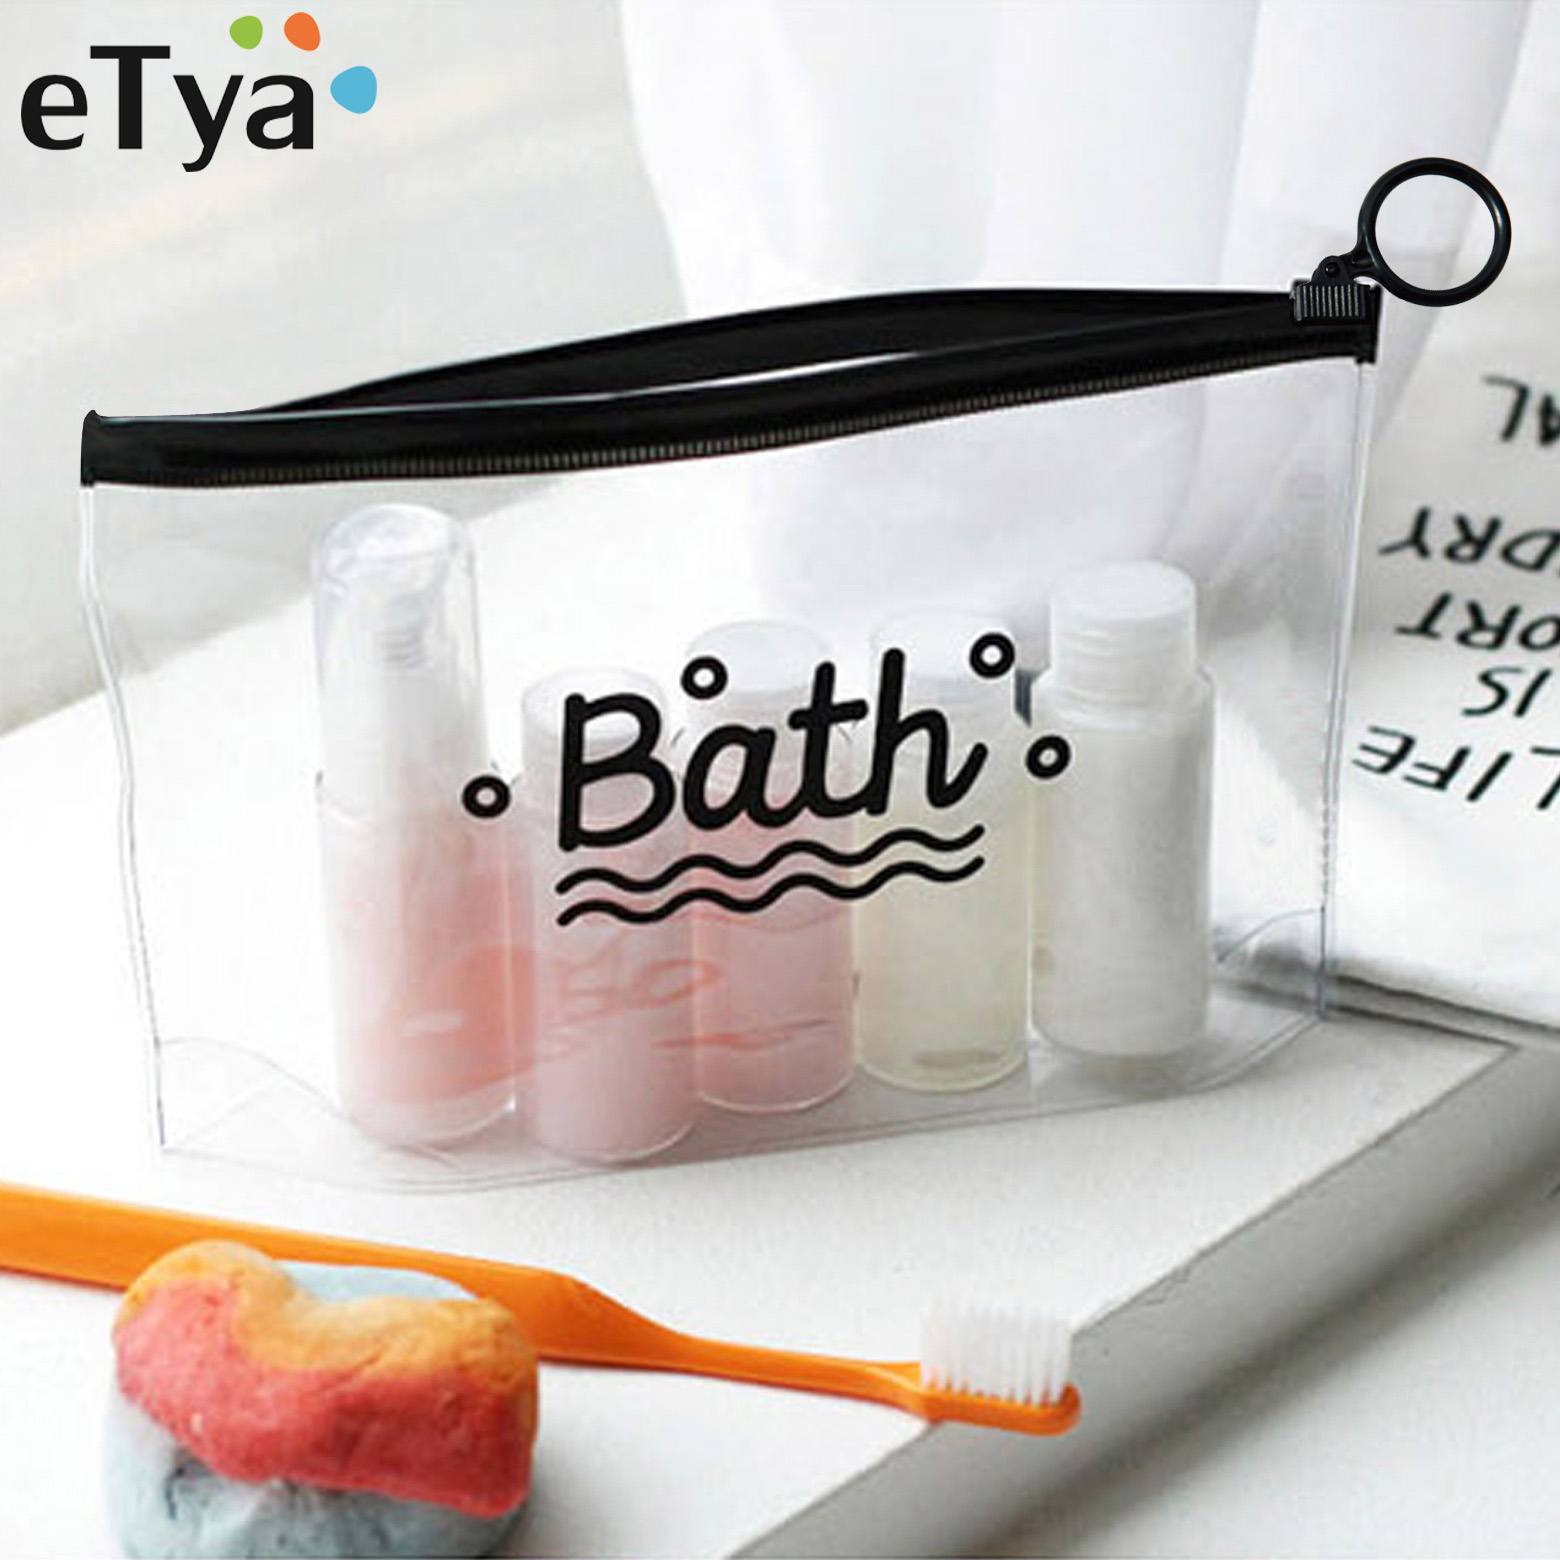 ETya Travel Cosmetic Bags PVC Waterproof Transparent Women Portable Make Up Bag Toiletry Organizer Storage Makeup Bag Wash Pouch